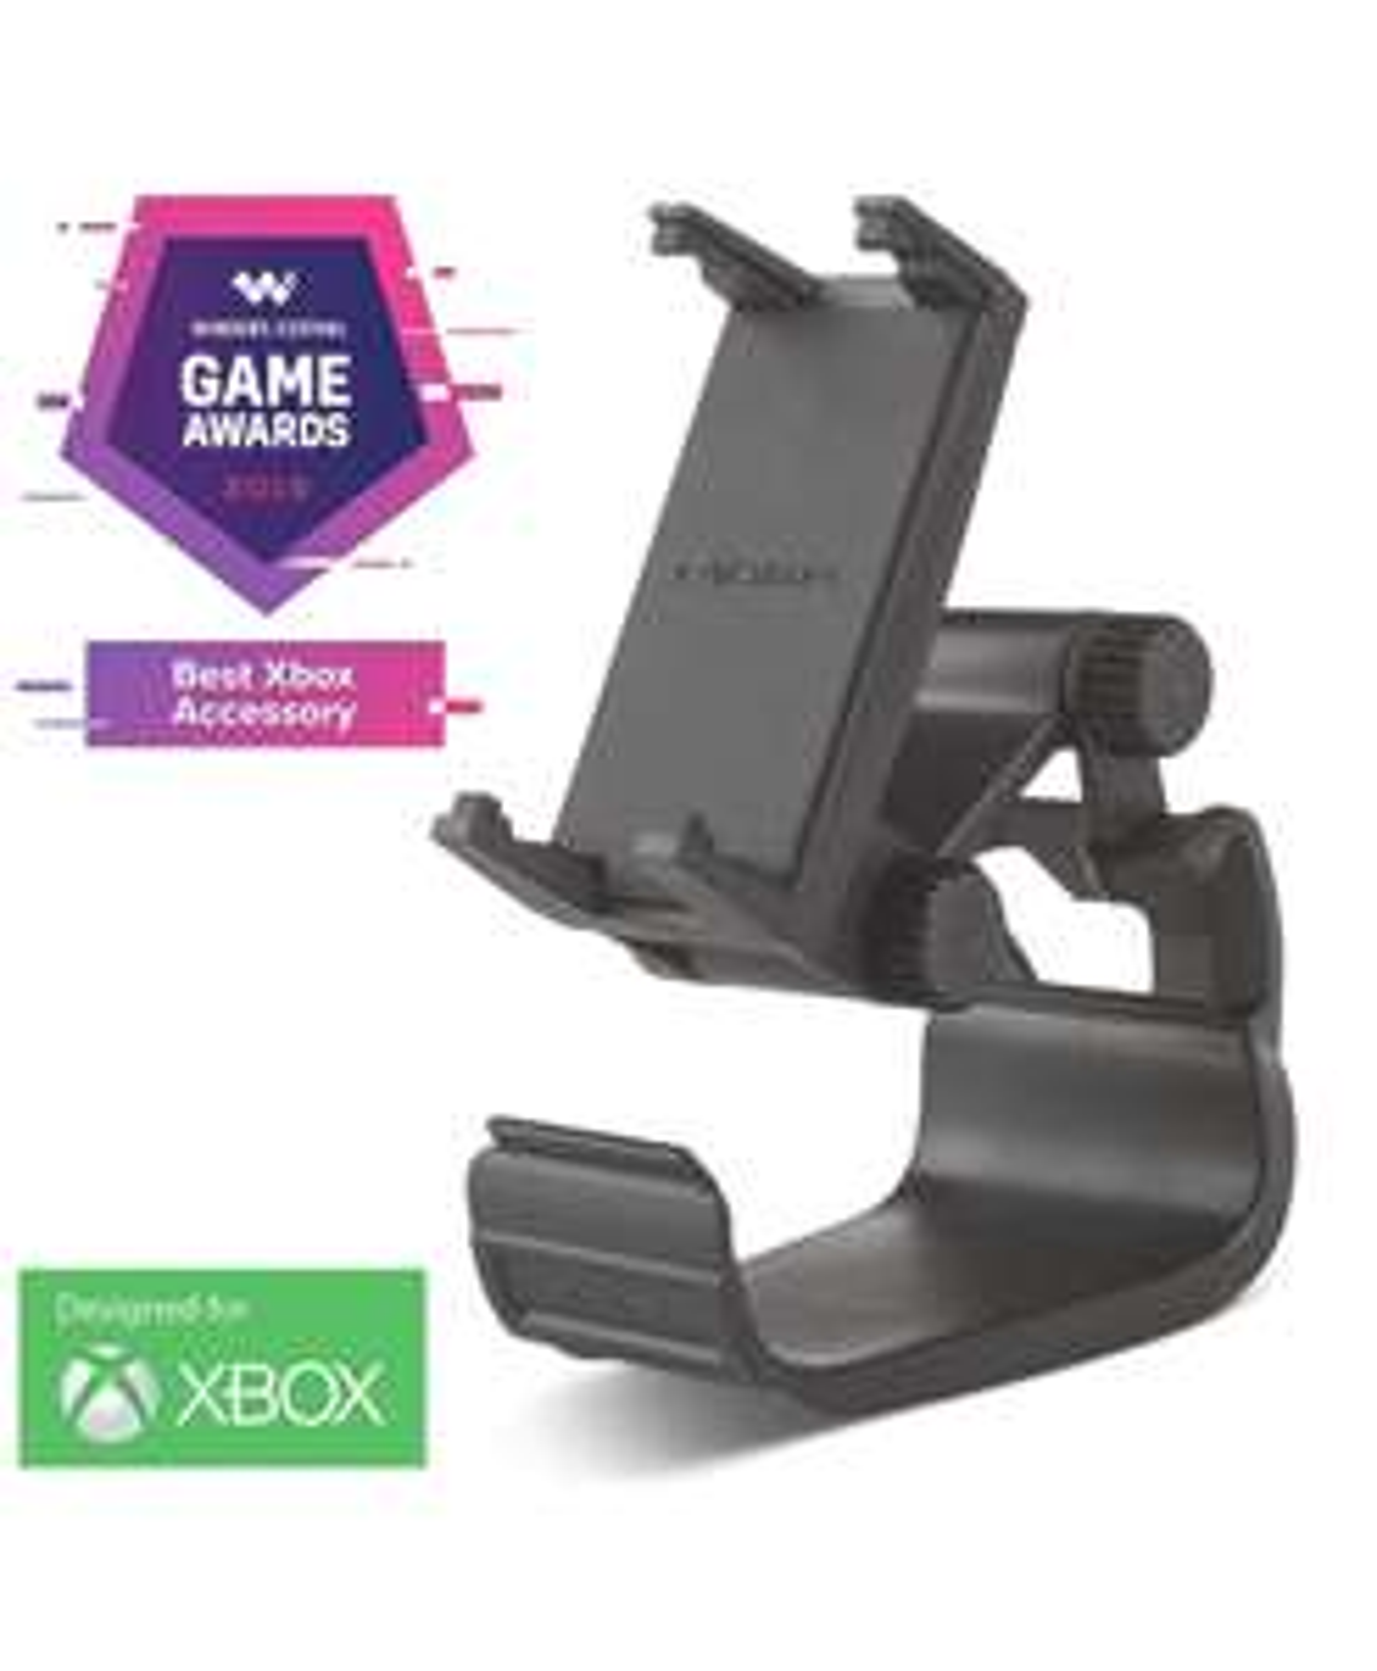 PowerA MOGA Mobile Gaming Clip for Xbox £14.99 at Microsoft (Microsoft Store)